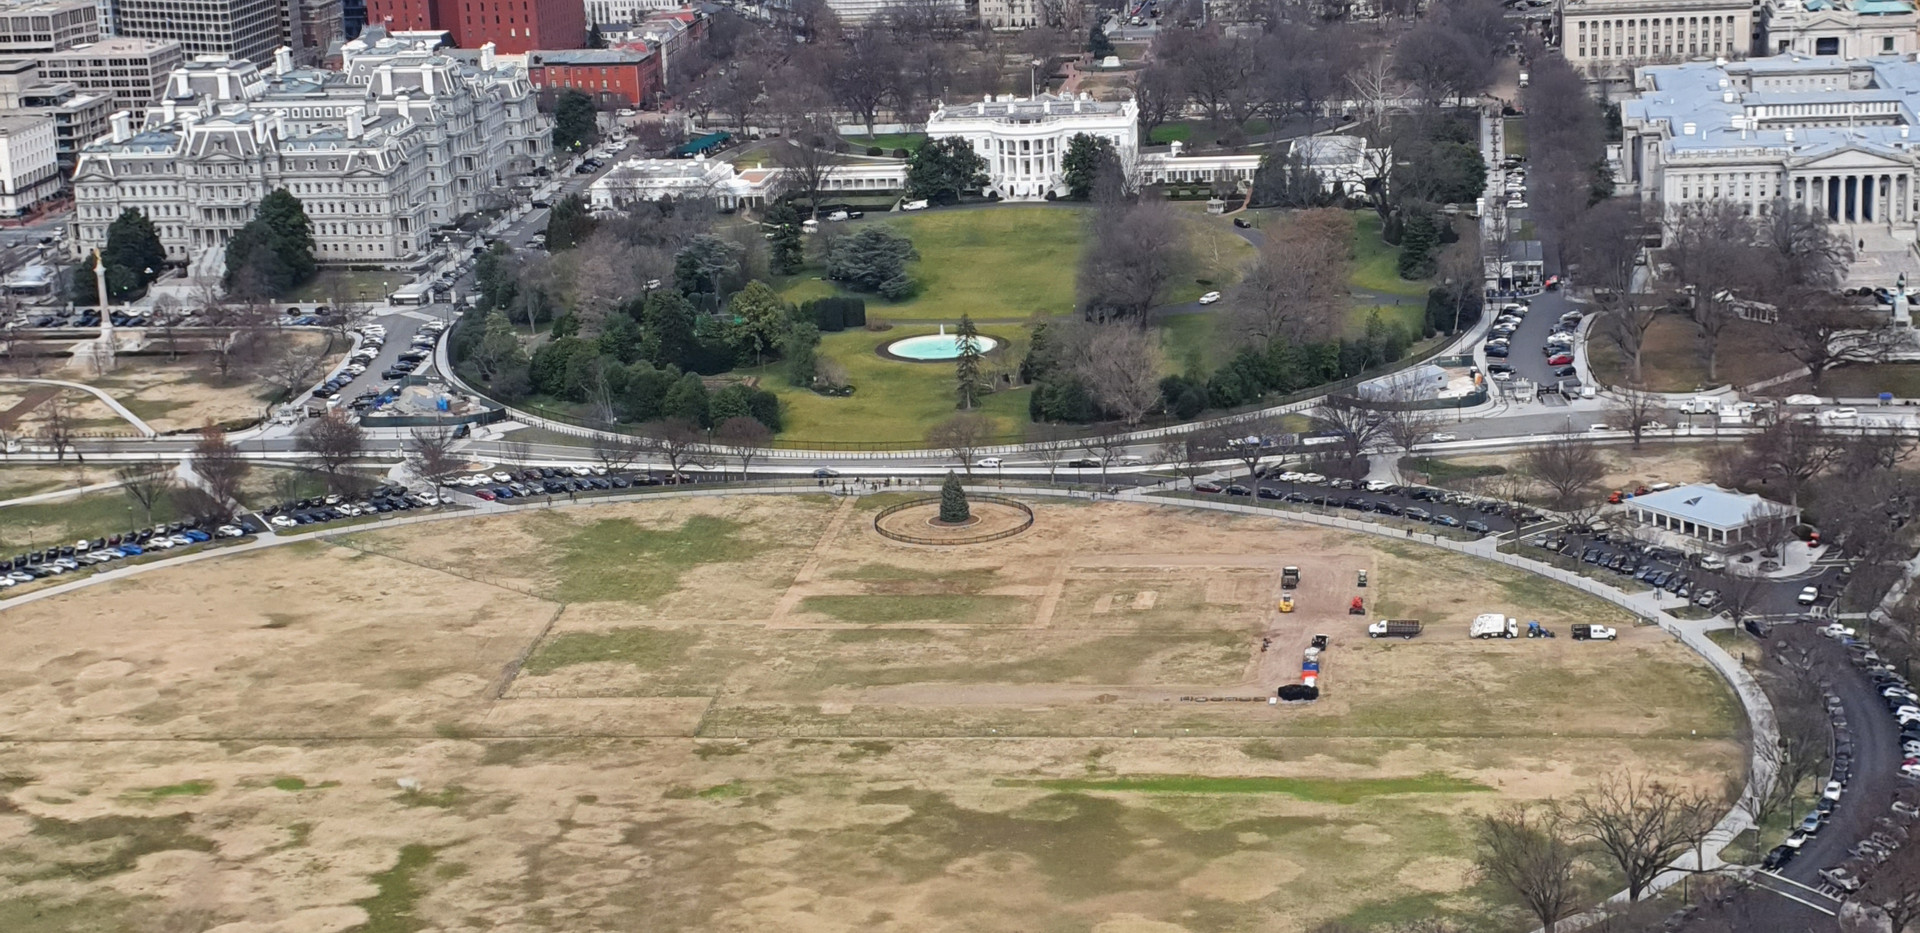 Vista norte - Washington Monument